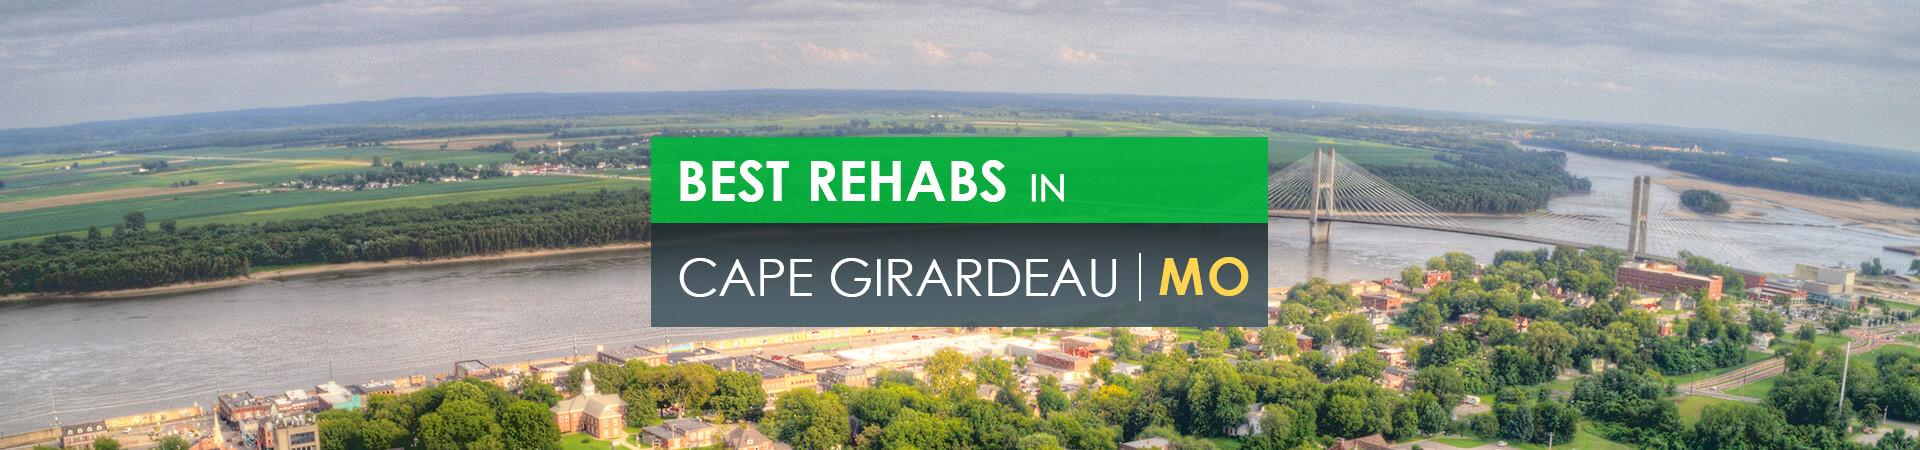 Best rehabs in Cape Girardeau, MO